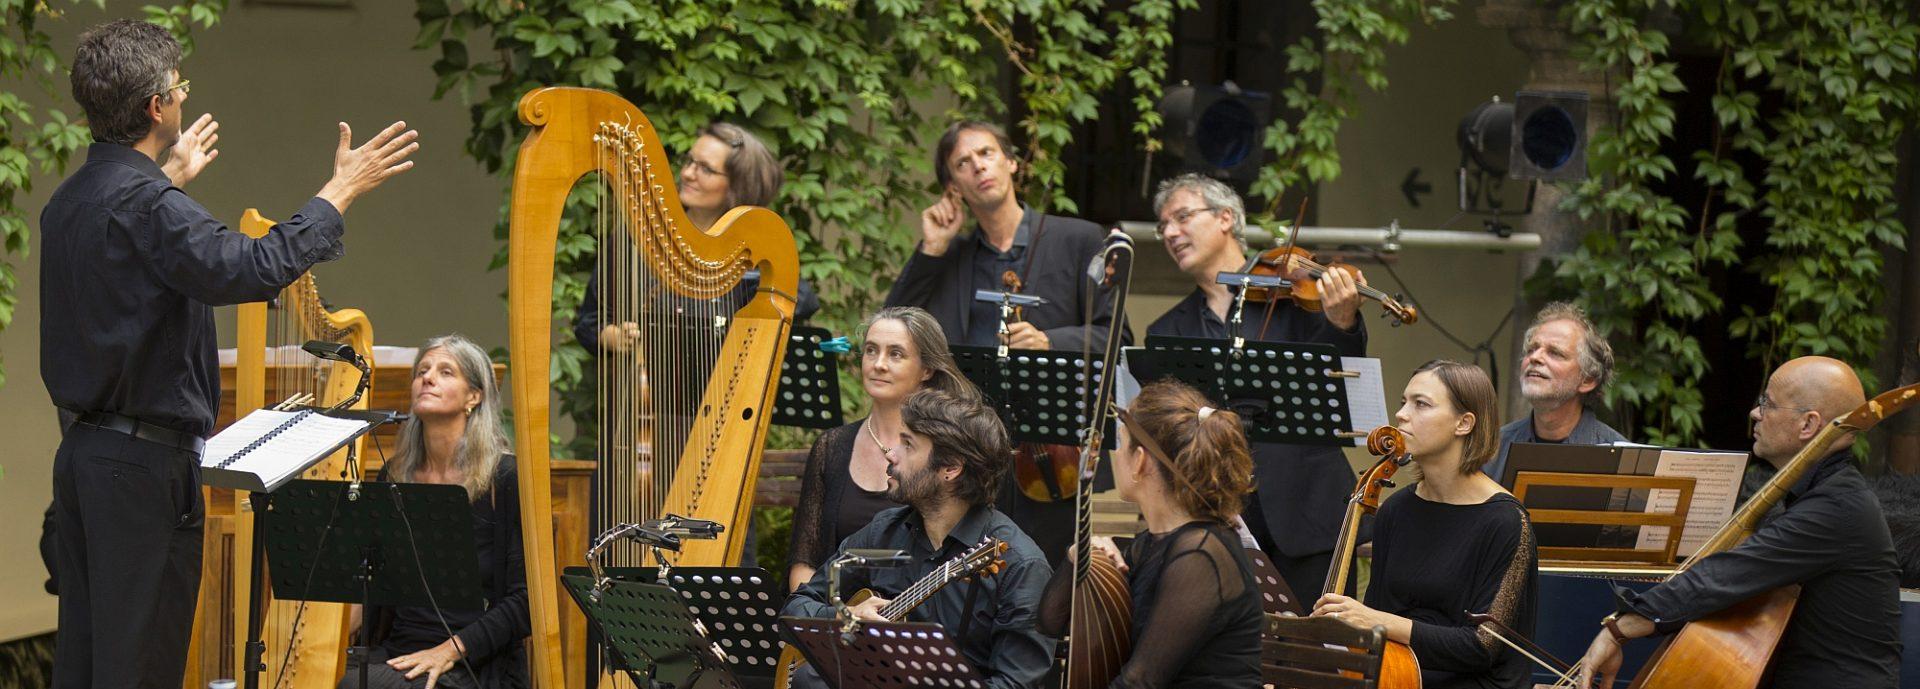 Harfe Harfen Arpa Harpe  Harpa